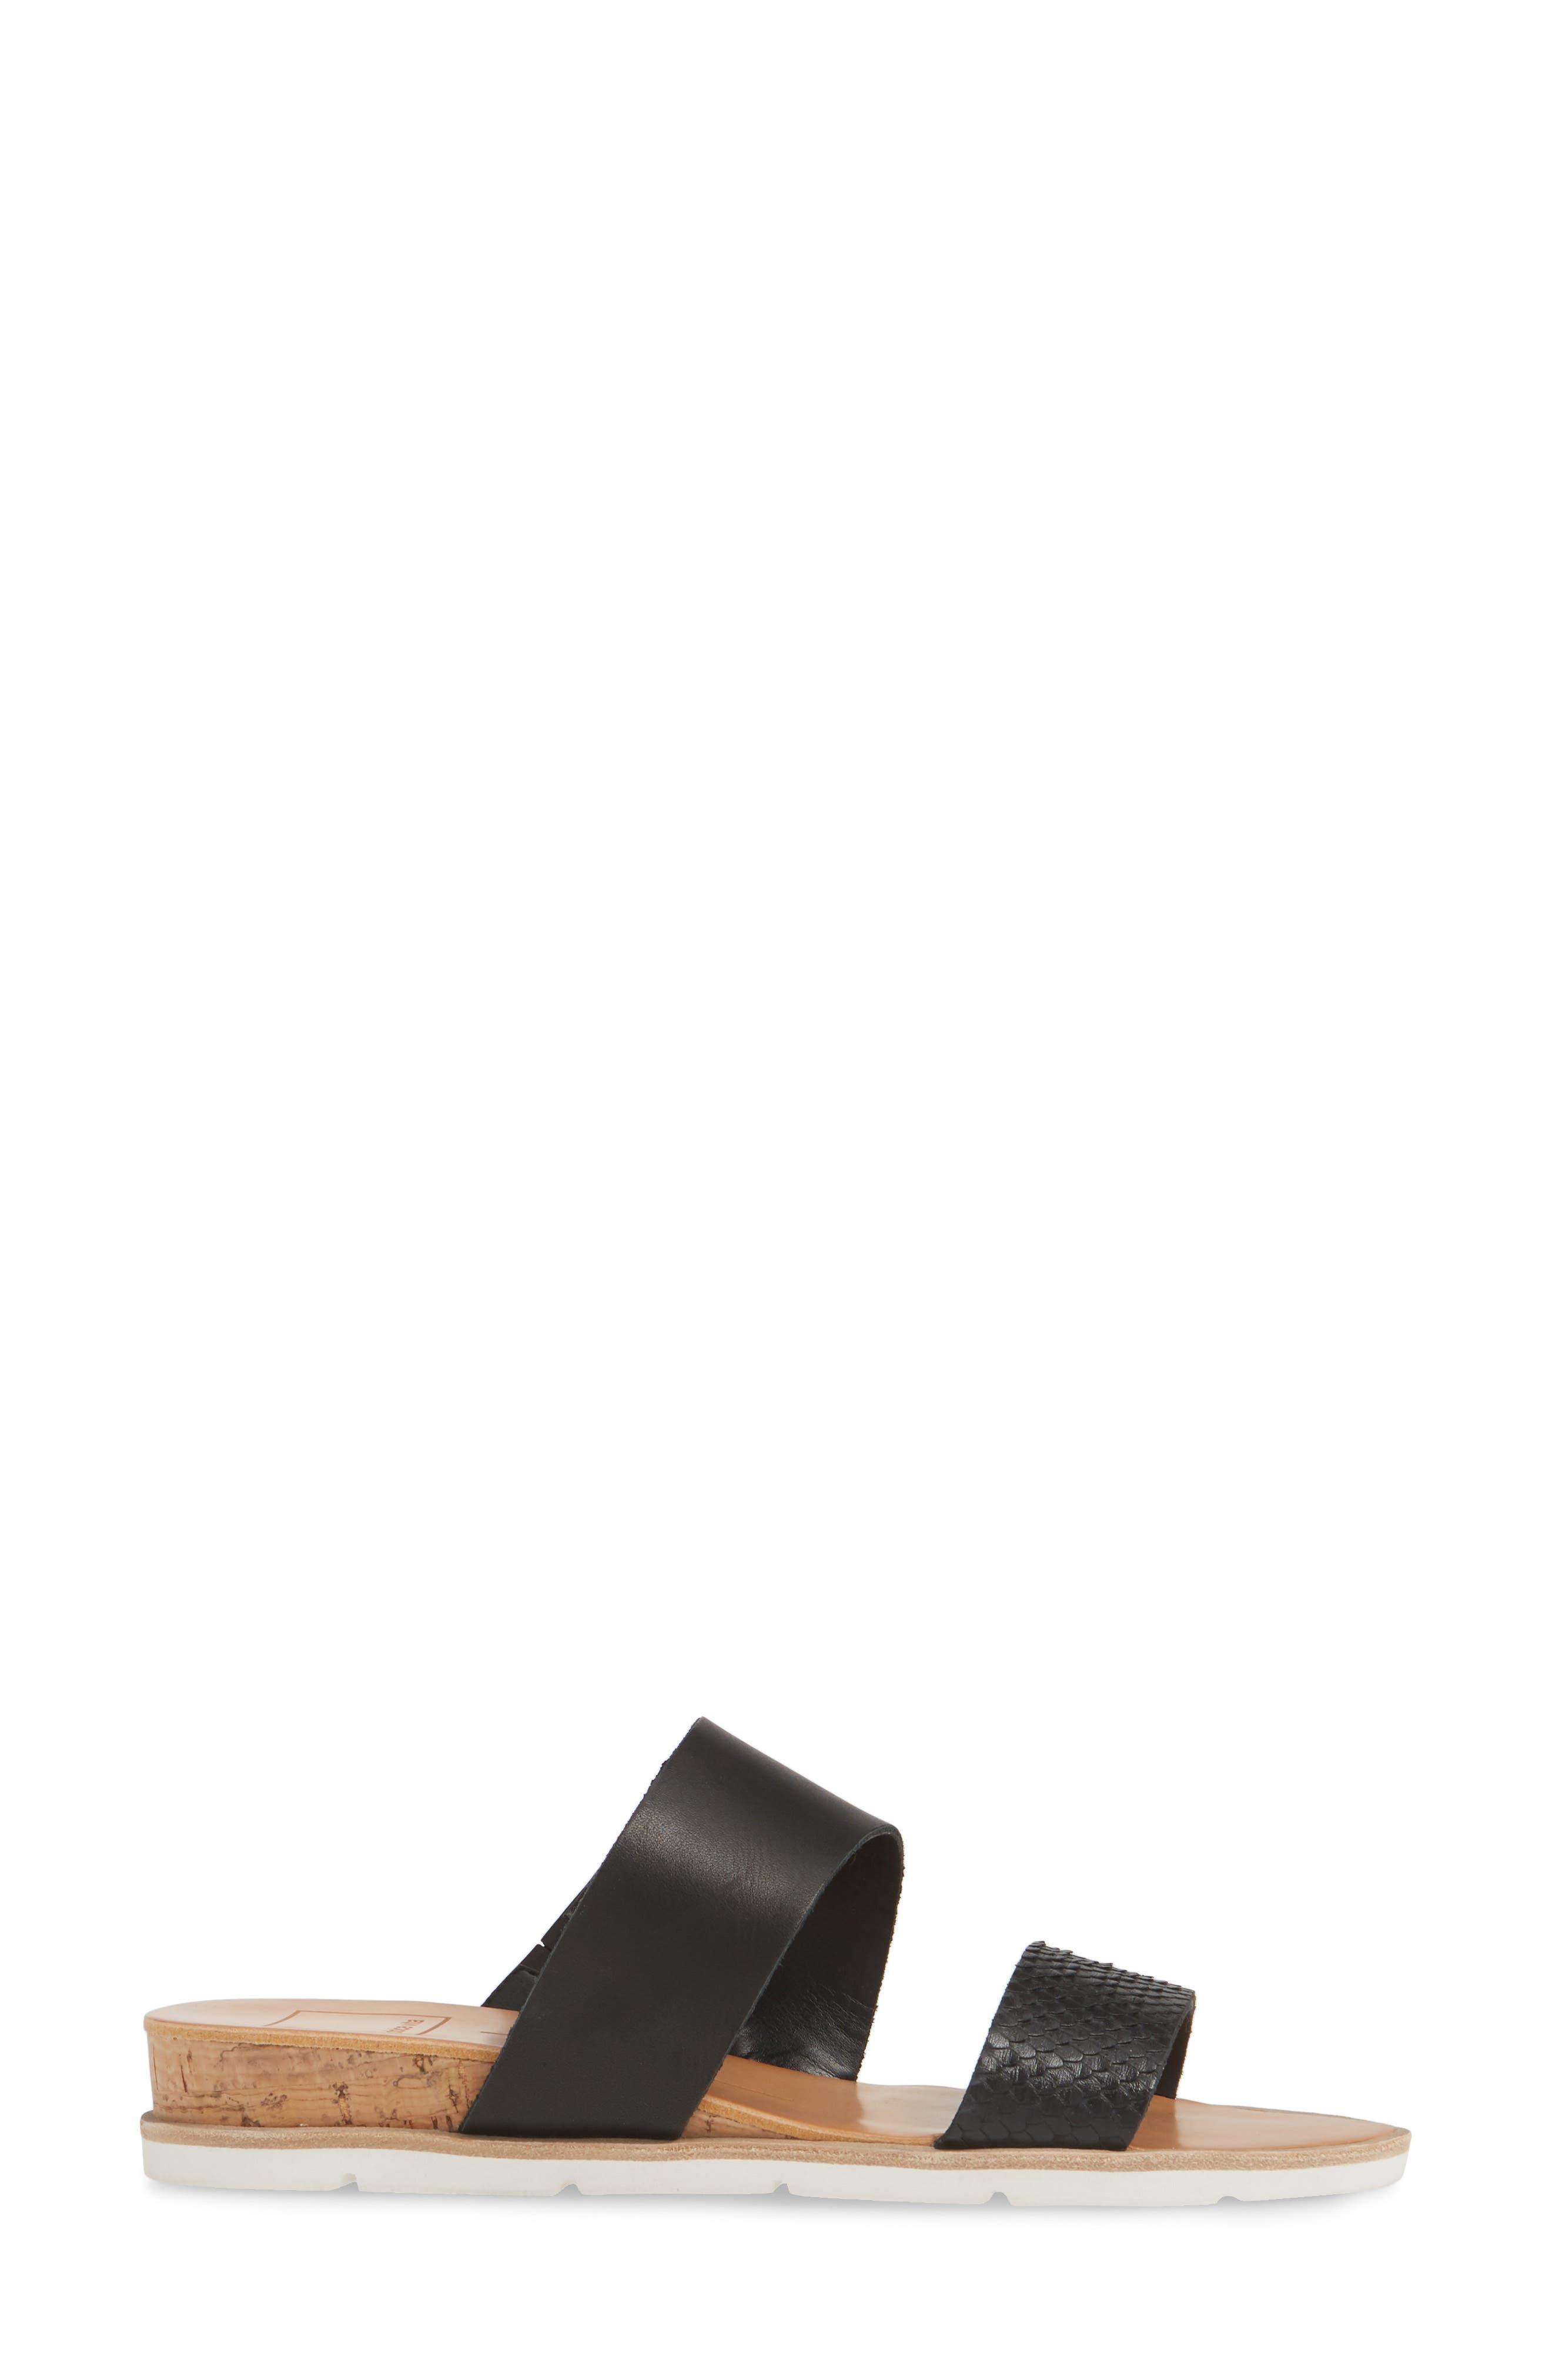 DOLCE VITA, Vala Wedge Slide Sandal, Alternate thumbnail 3, color, BLACK LEATHER